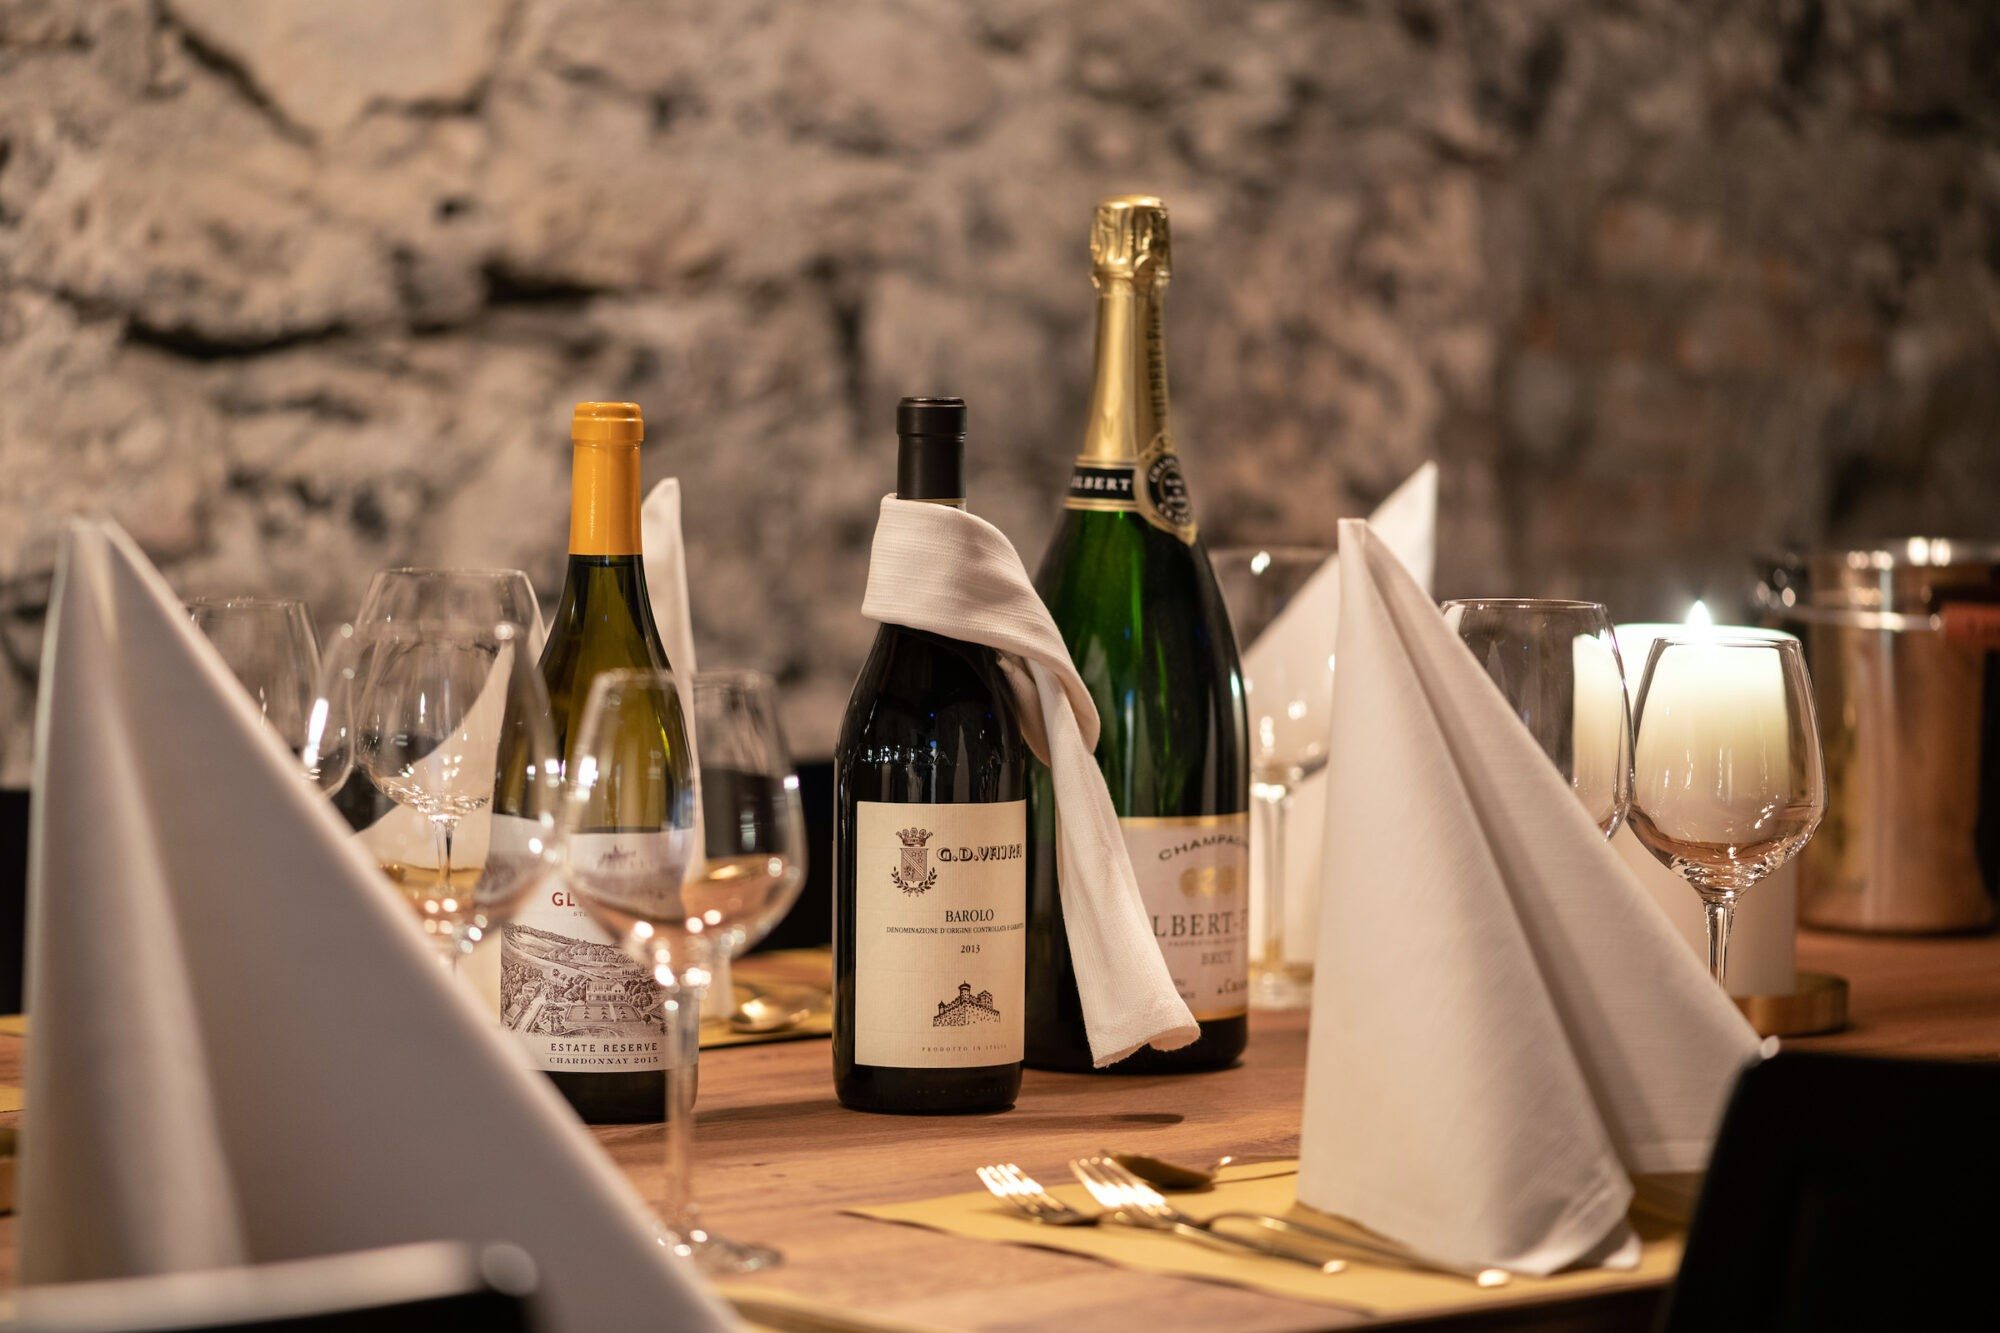 Wine cellar at Boutique Hotel and Restaurant Glacier Grindelwald